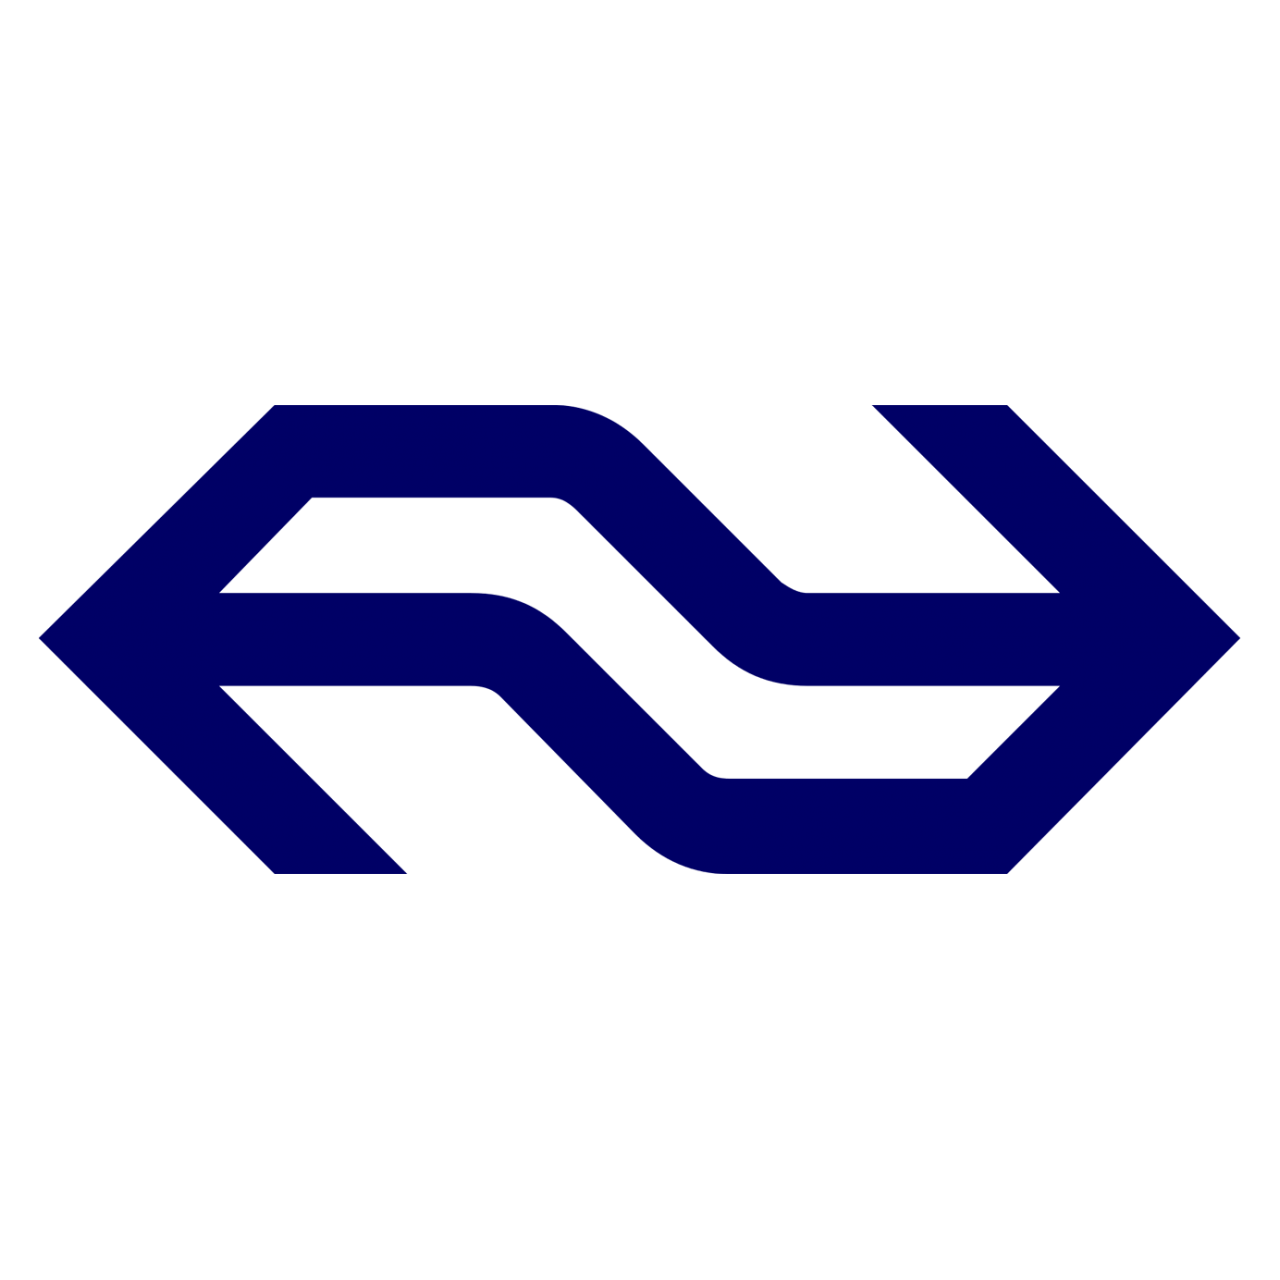 Nederlandse-spoorwegen-NS-logo